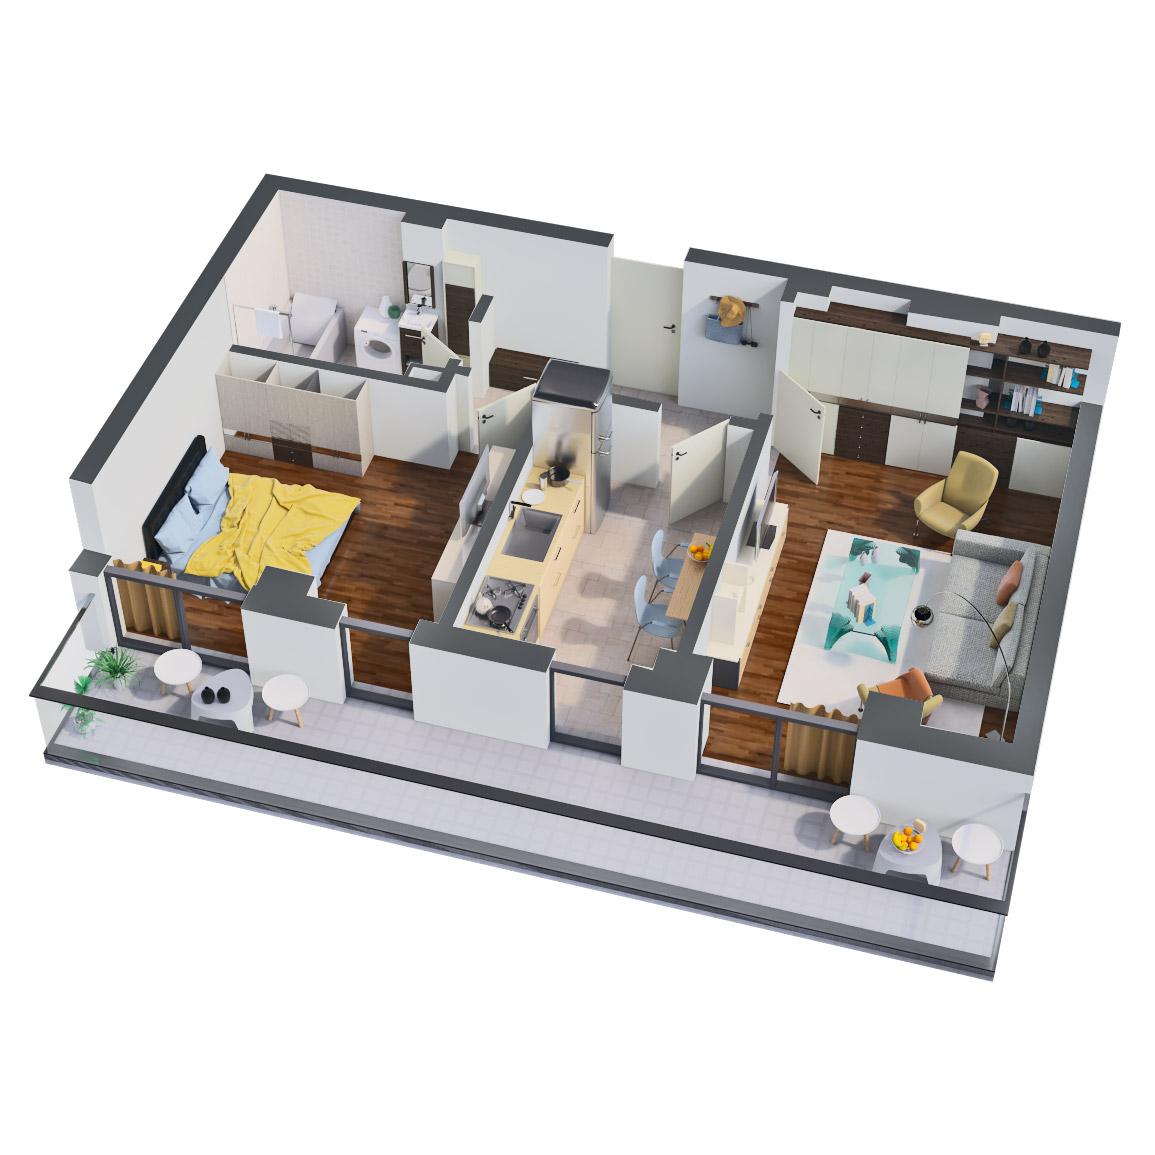 Apartament 2 camere de vanzare Bucuresti - Catedral Residence - Marriott, Piata Unirii, 13 Septembrie, Izvor - Tip 2 - T2 - B